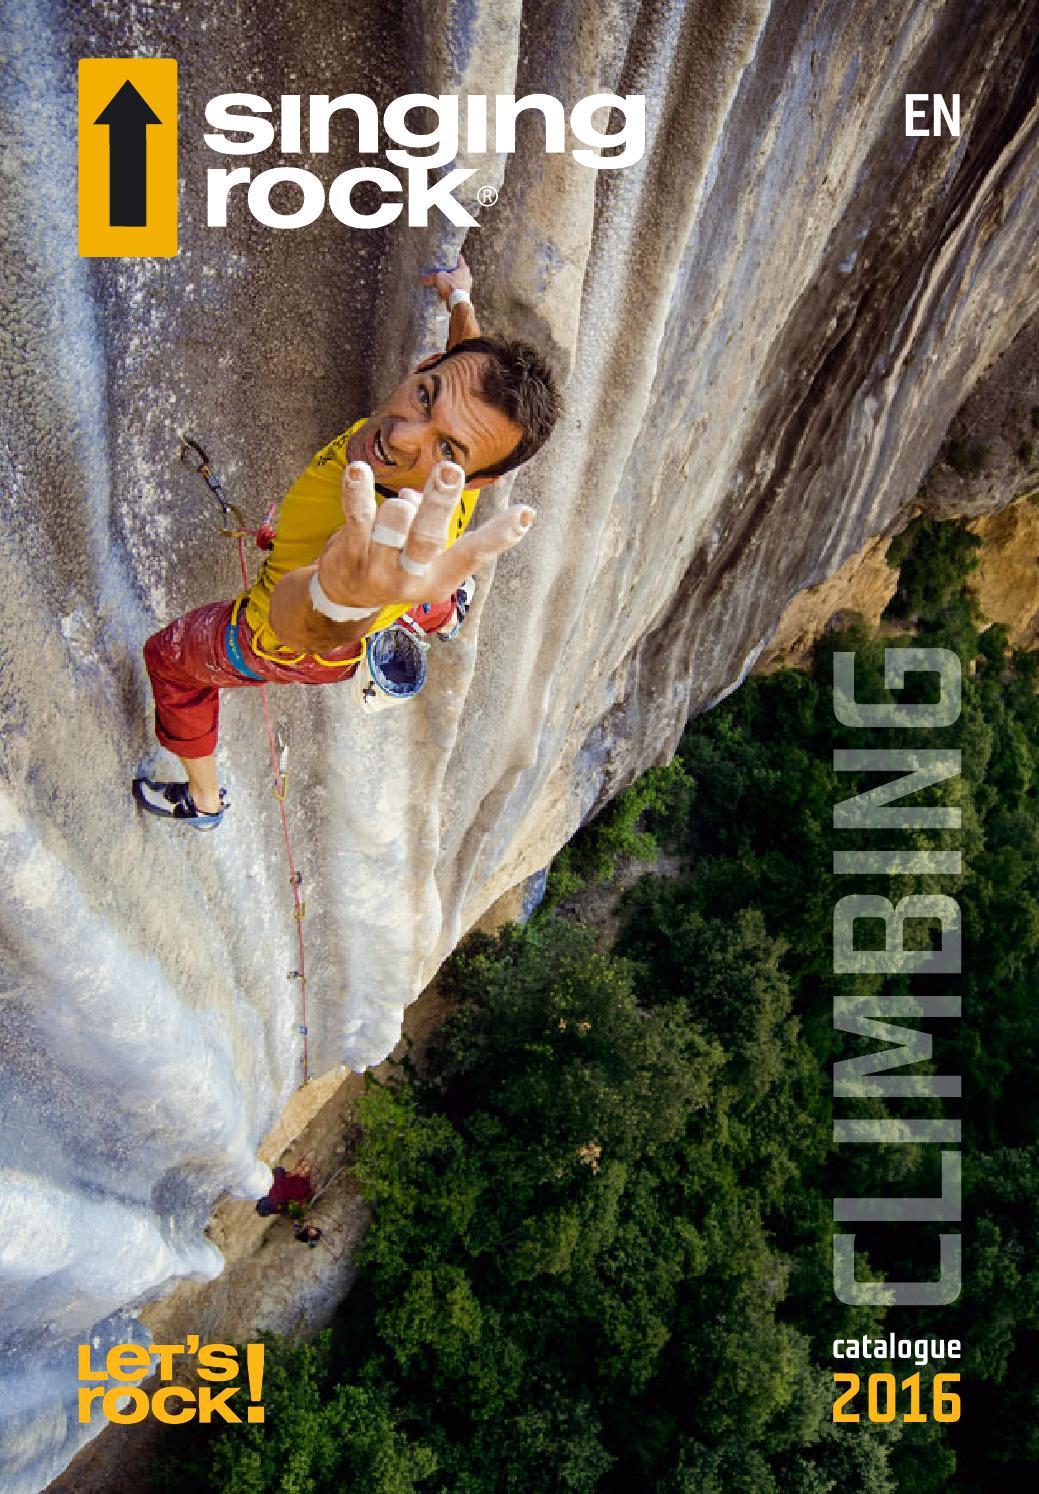 by Singing Rock L - XXL Singing Rock Versa Multi-Purpose Climbing Harness